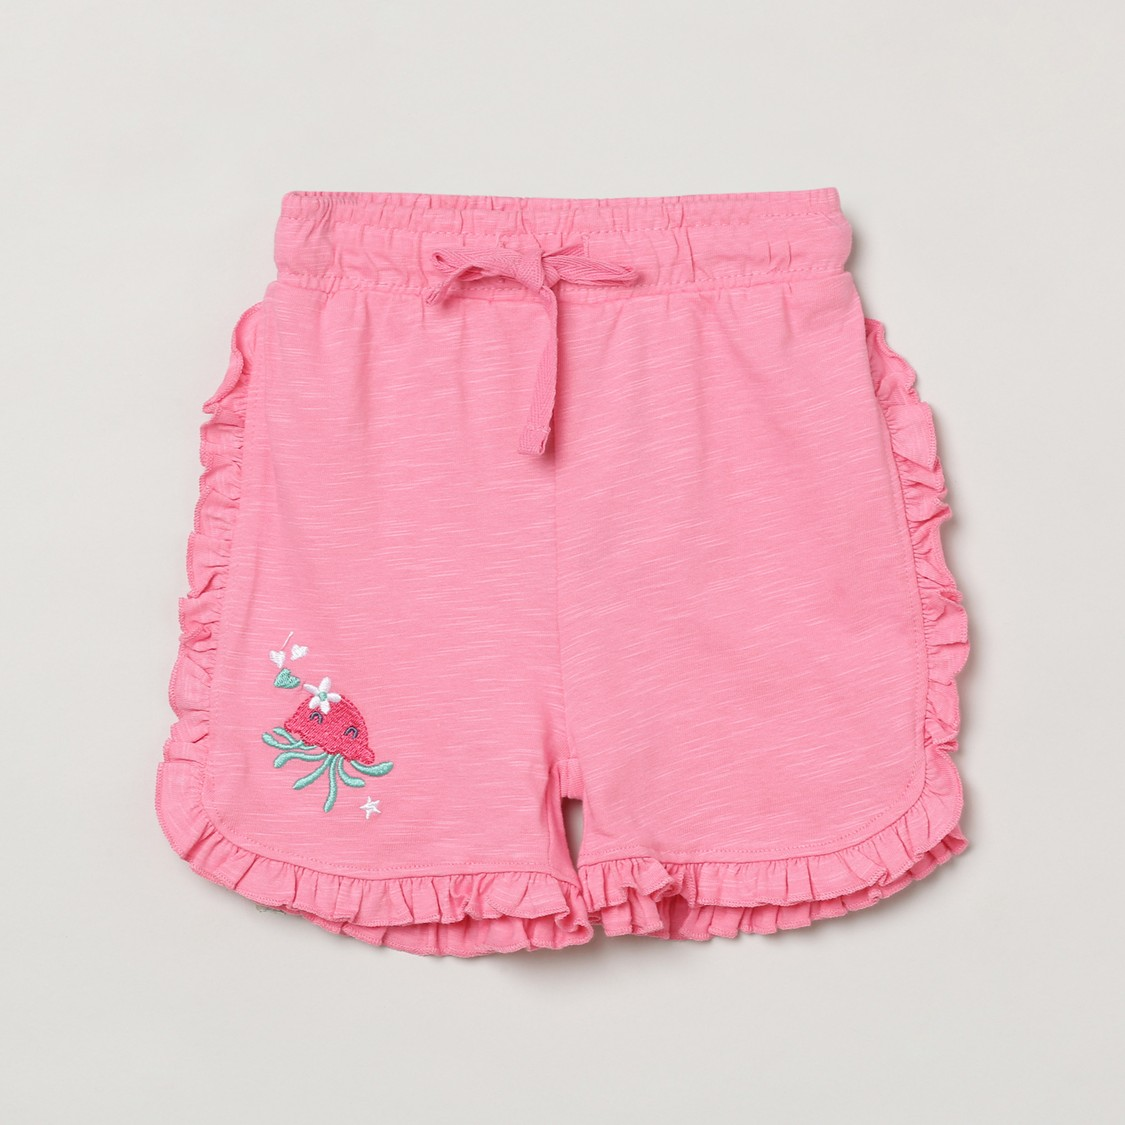 MAX Embroidered Drawstring Waist Shorts